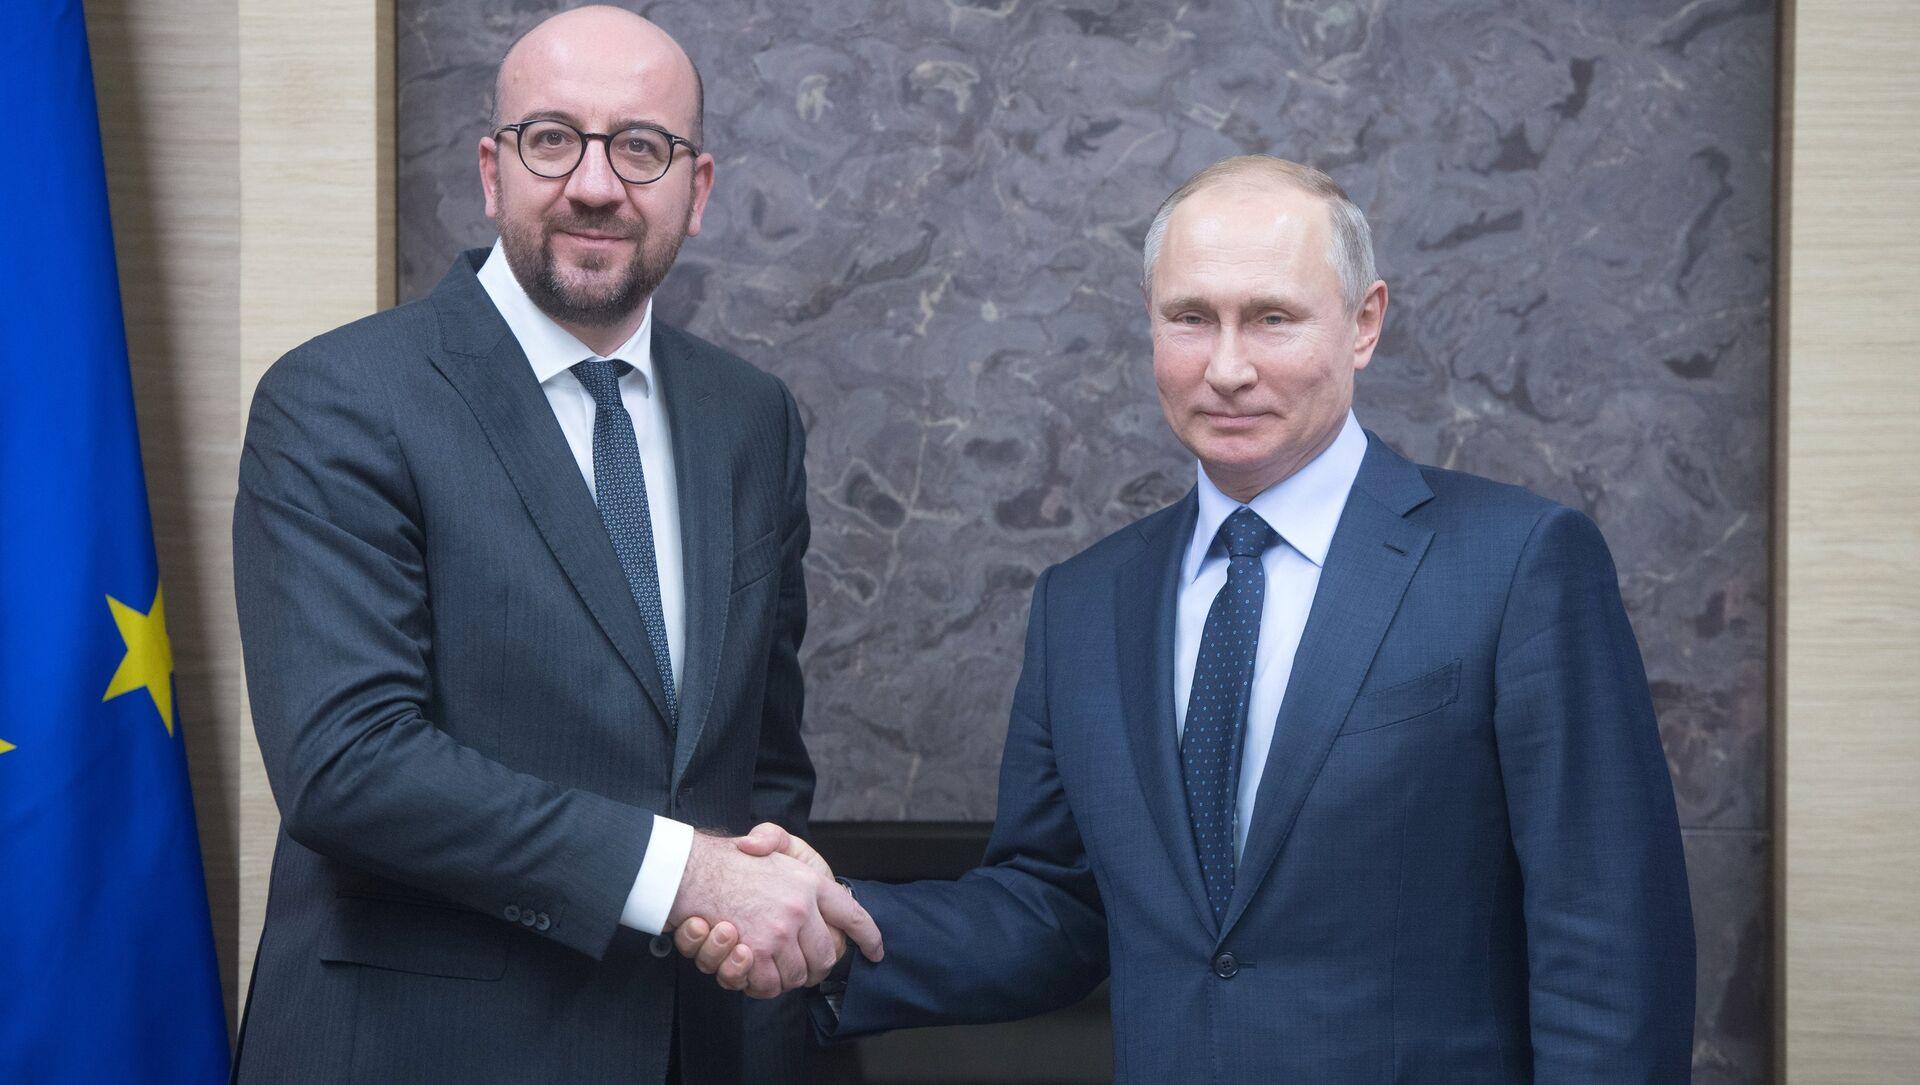 Шарл Мишел и Владимир Путин - Sputnik Србија, 1920, 07.06.2021